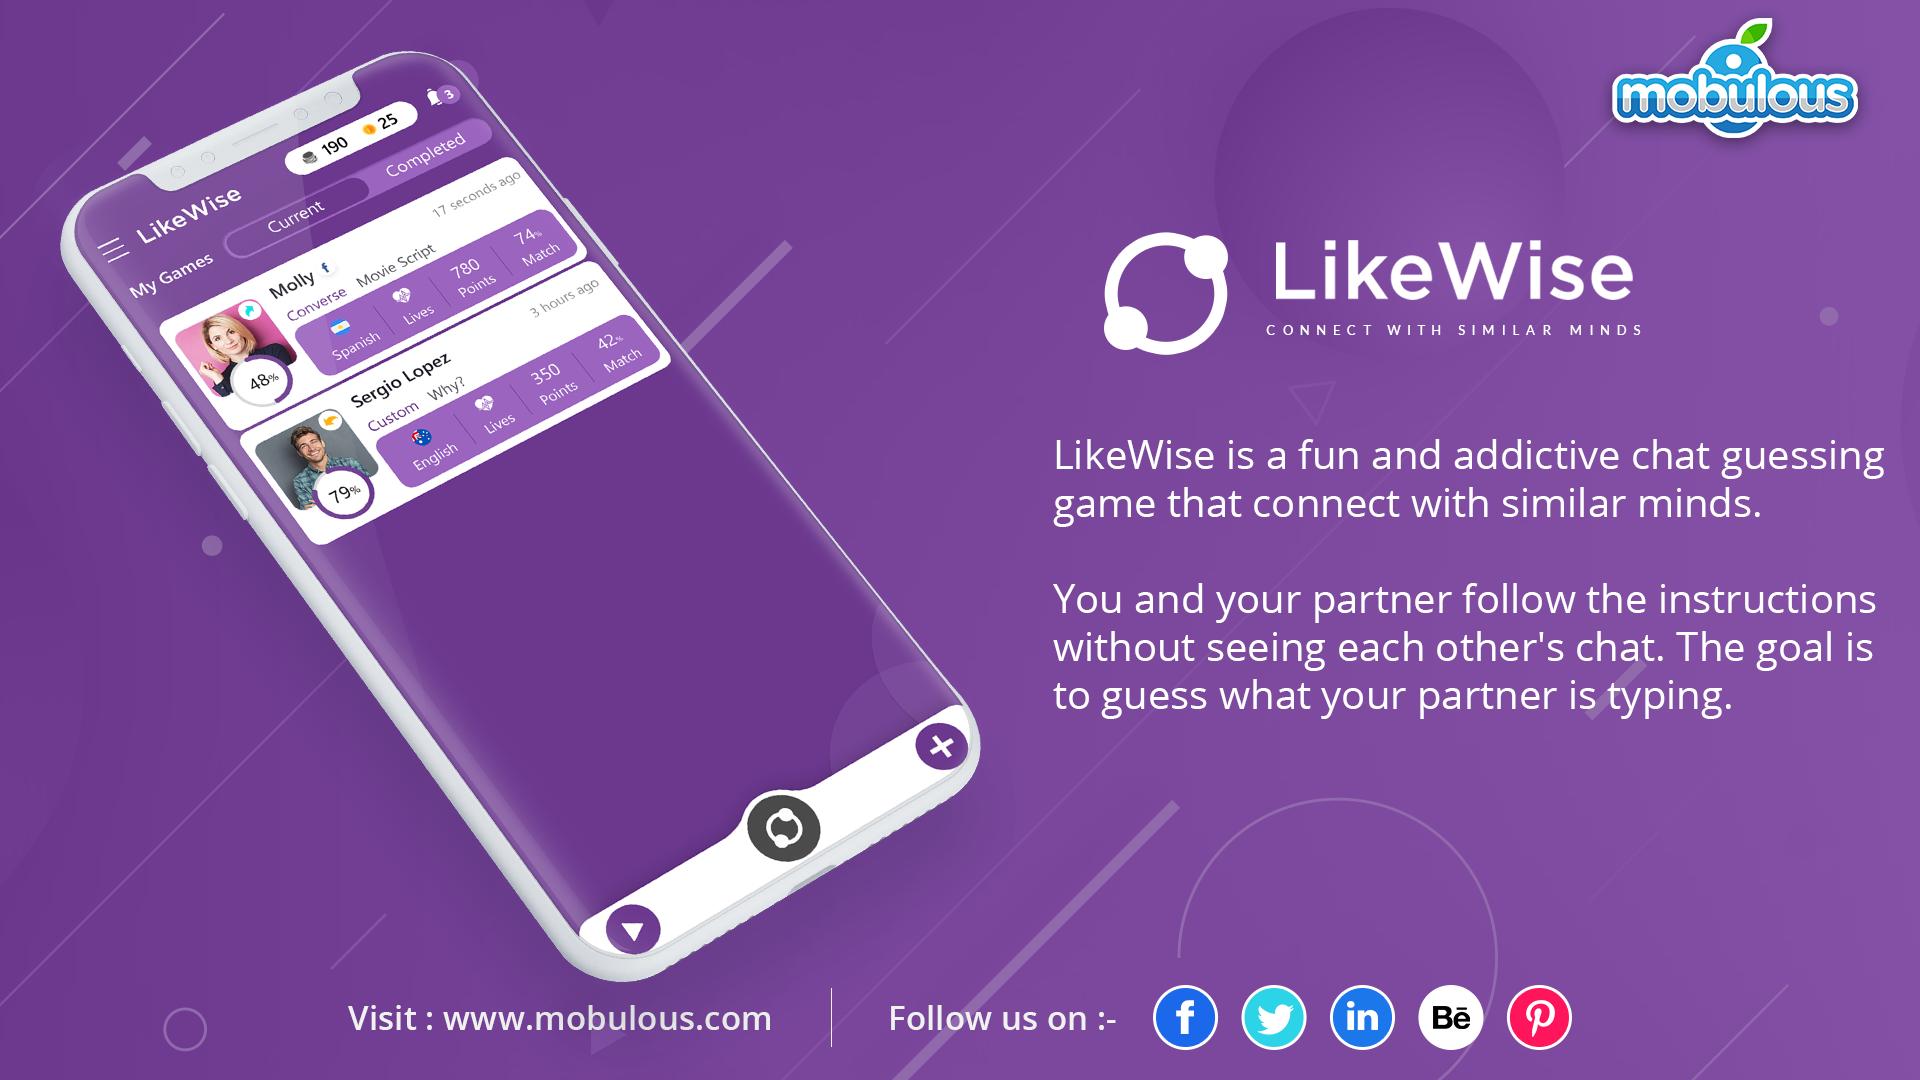 Likewise app